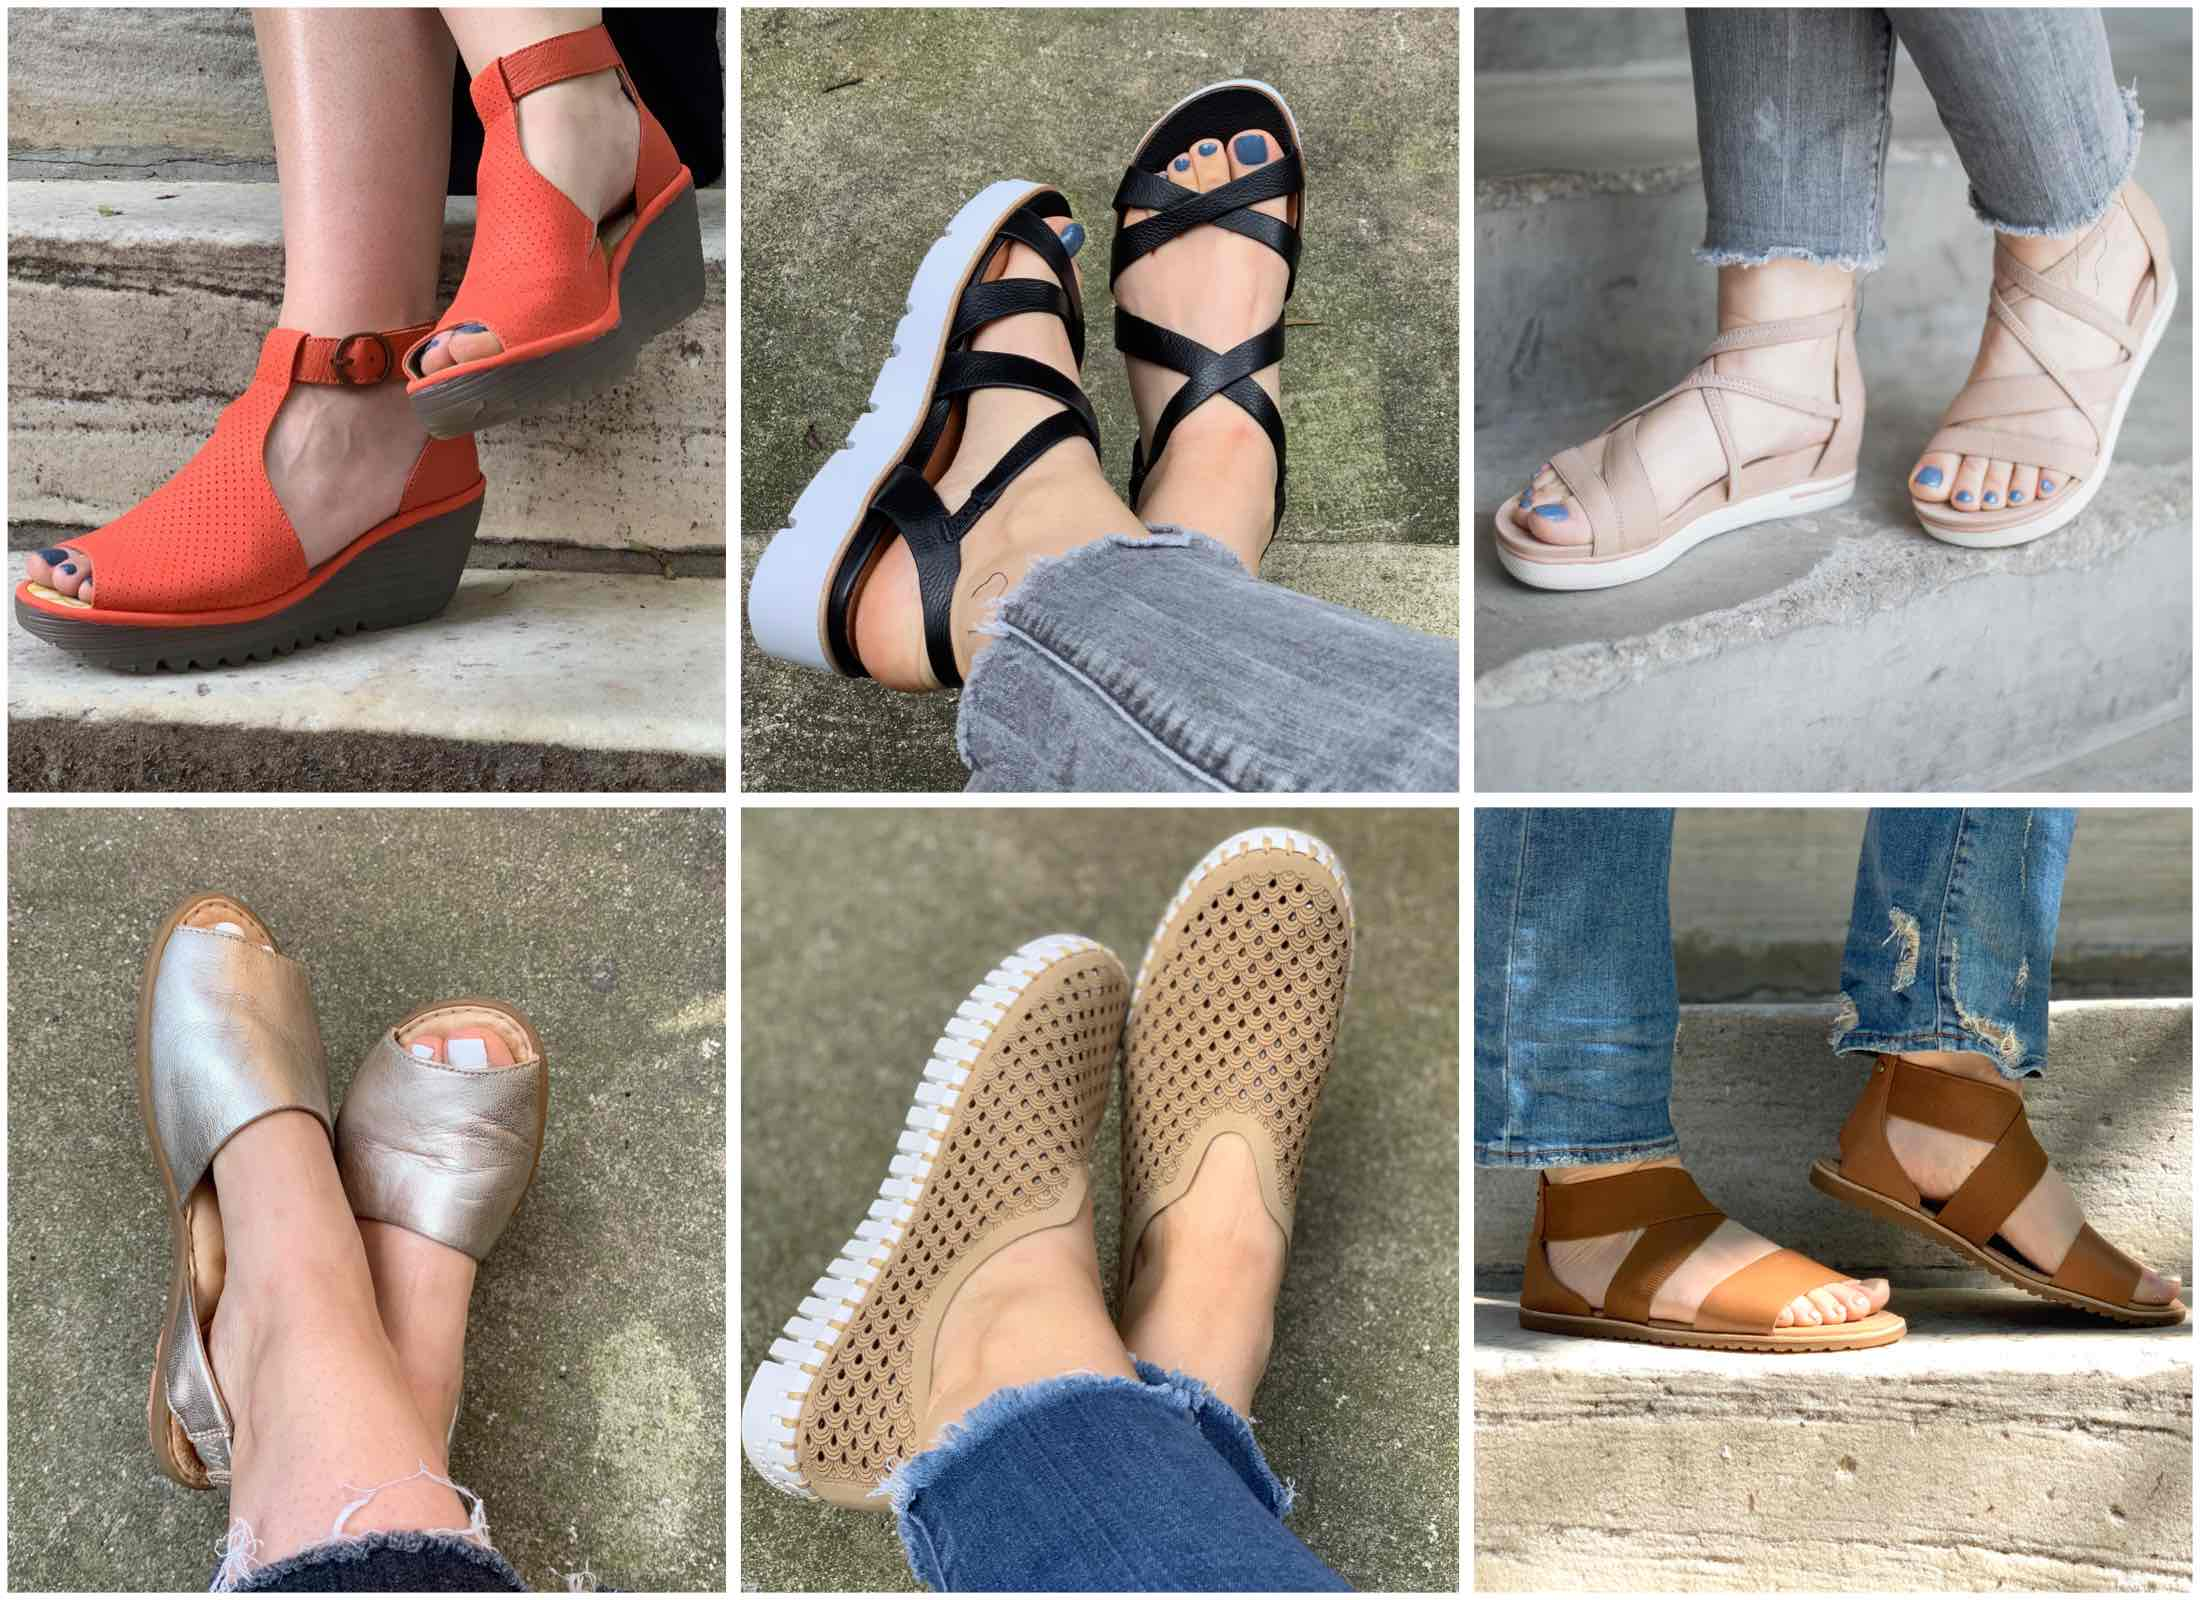 Summer Shoe Review: 15 Cute, Comfy